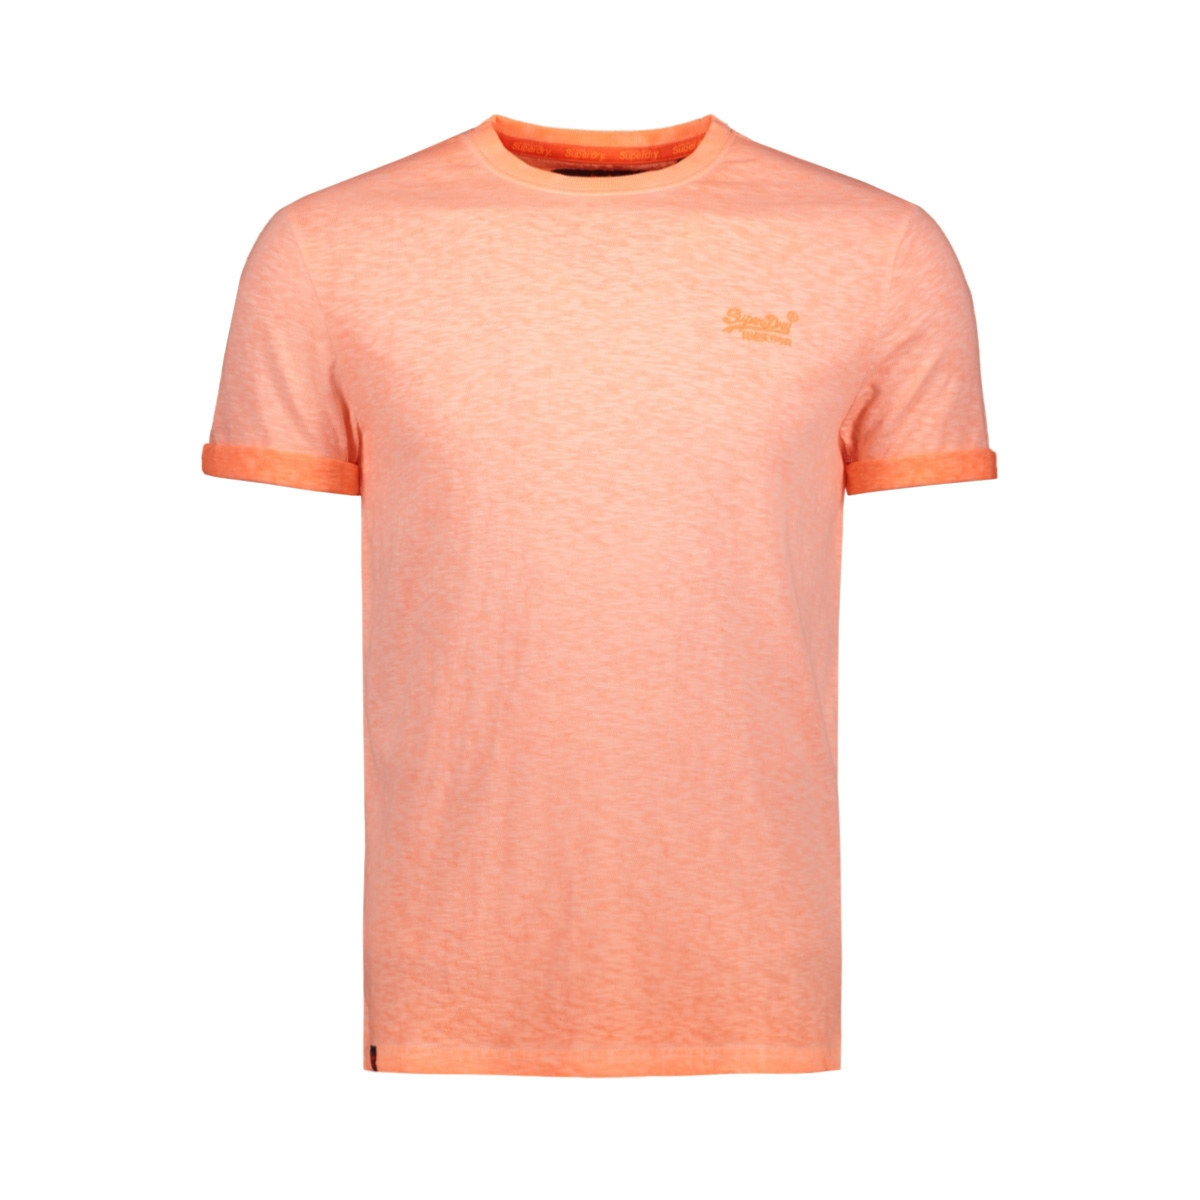 low roller tee m10101rt superdry t-shirt hyper pop orange